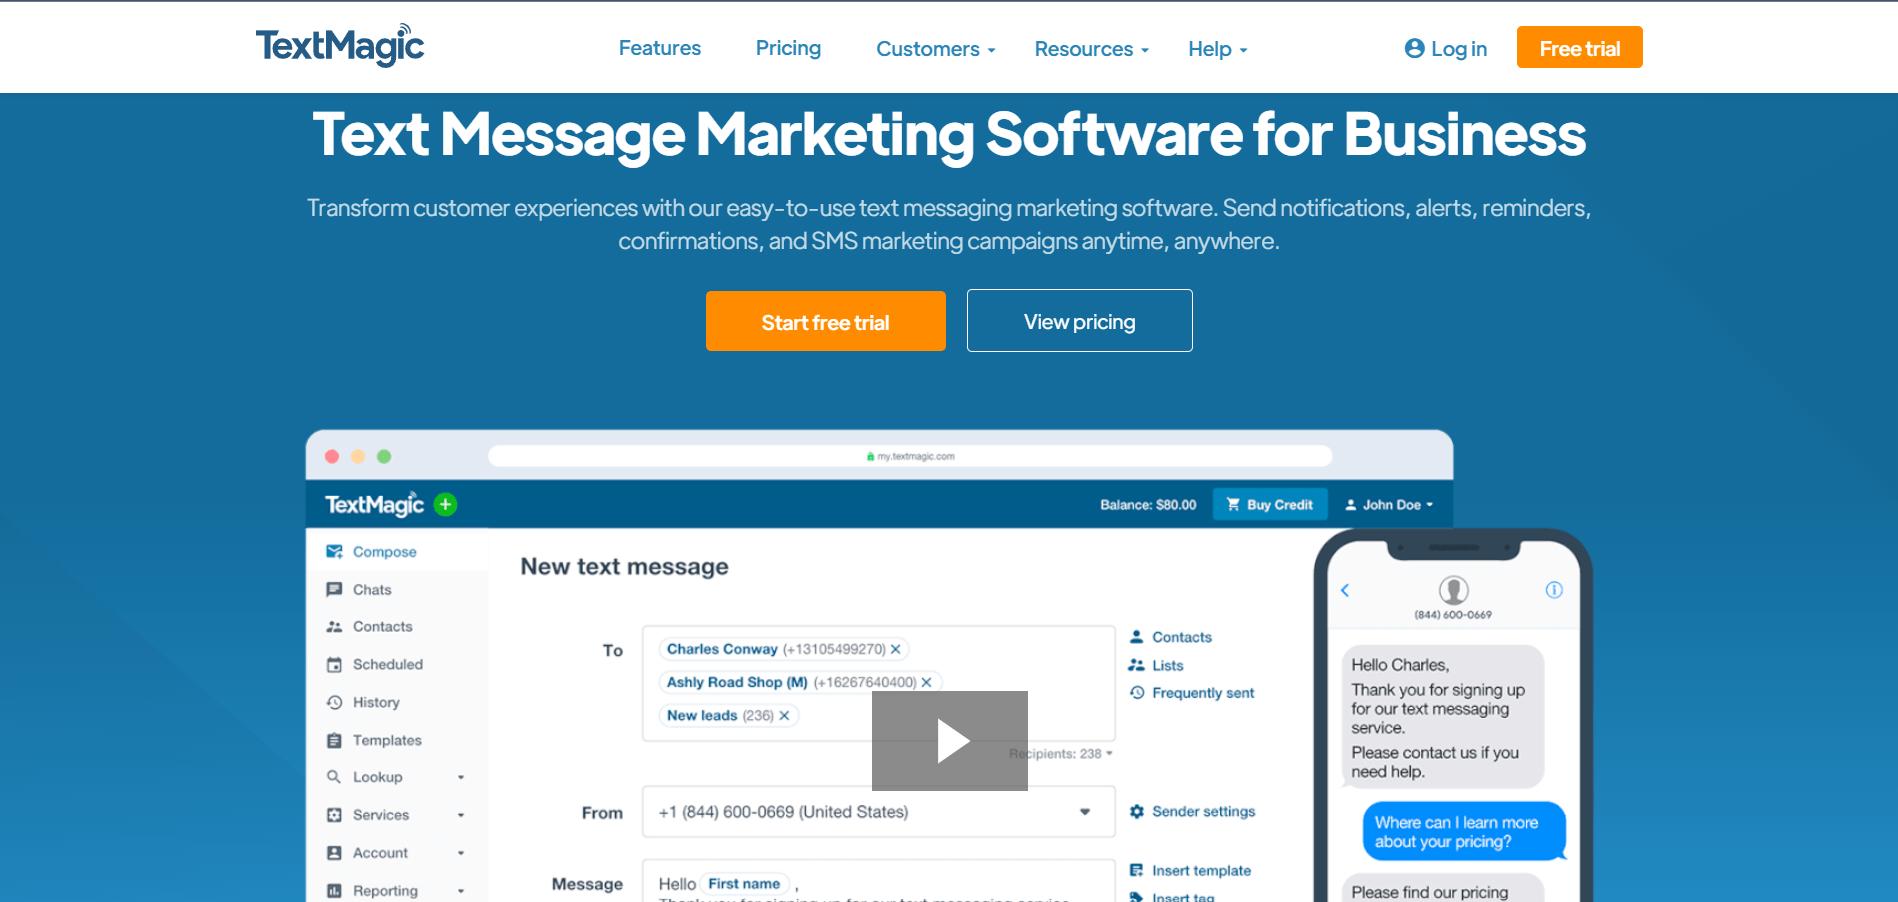 textmagic for customer experience